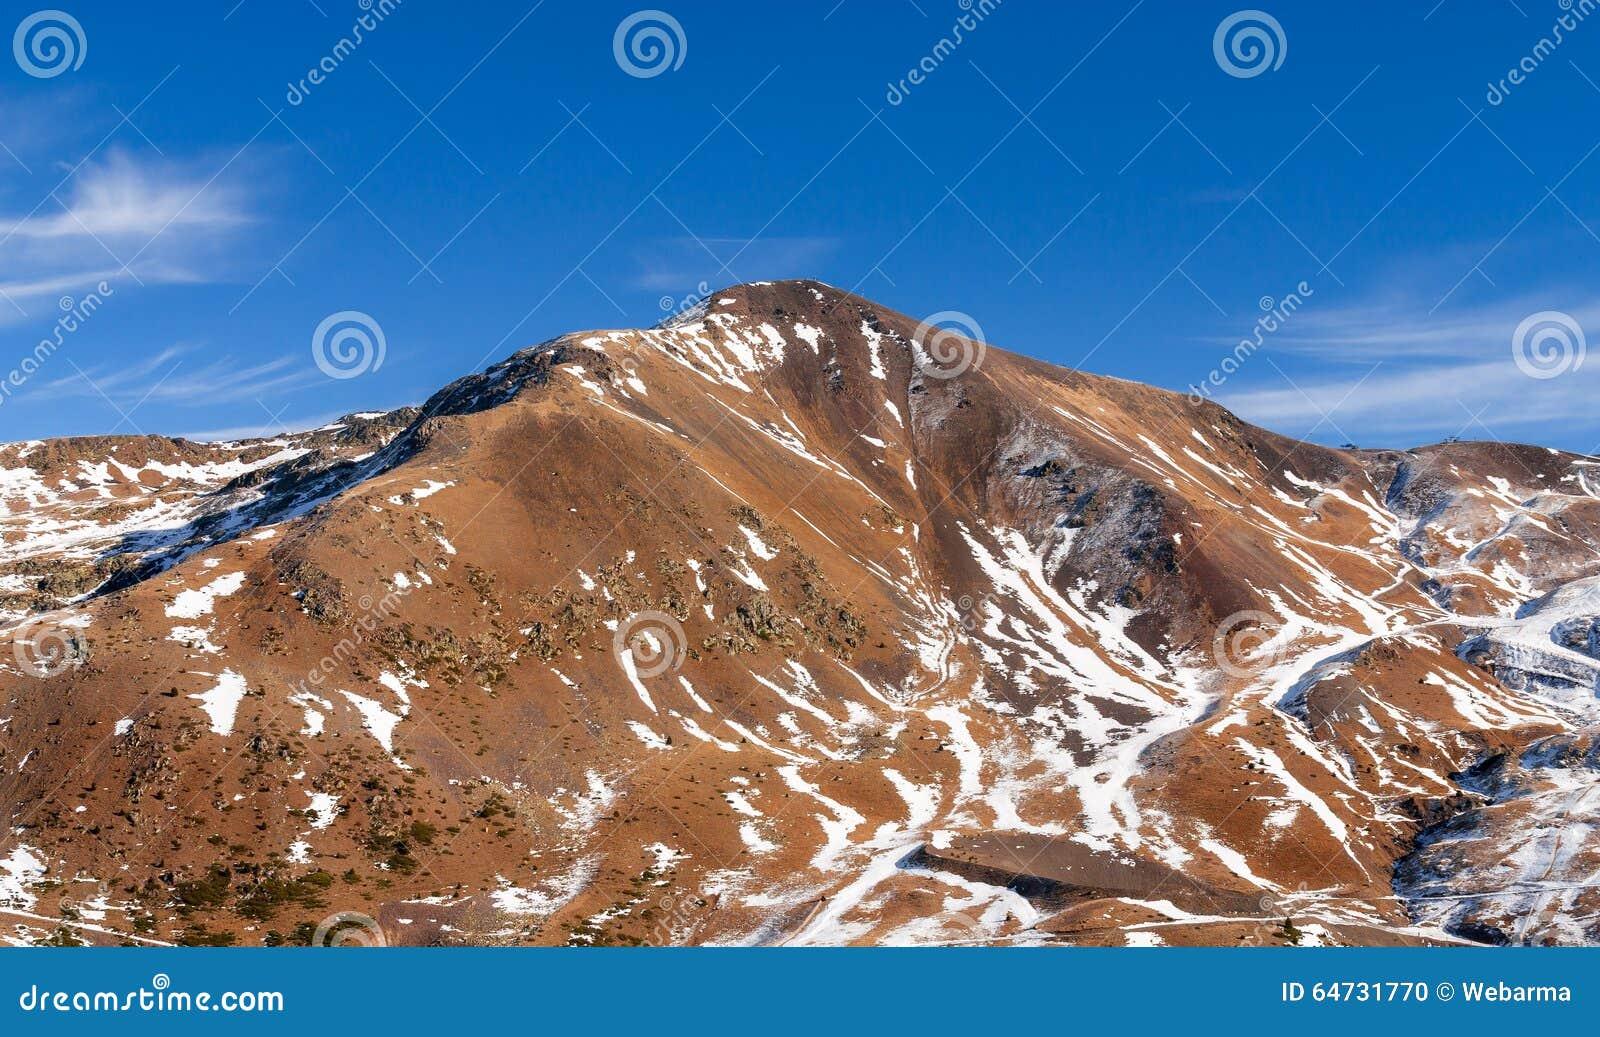 Montagne con neve - Pirenei